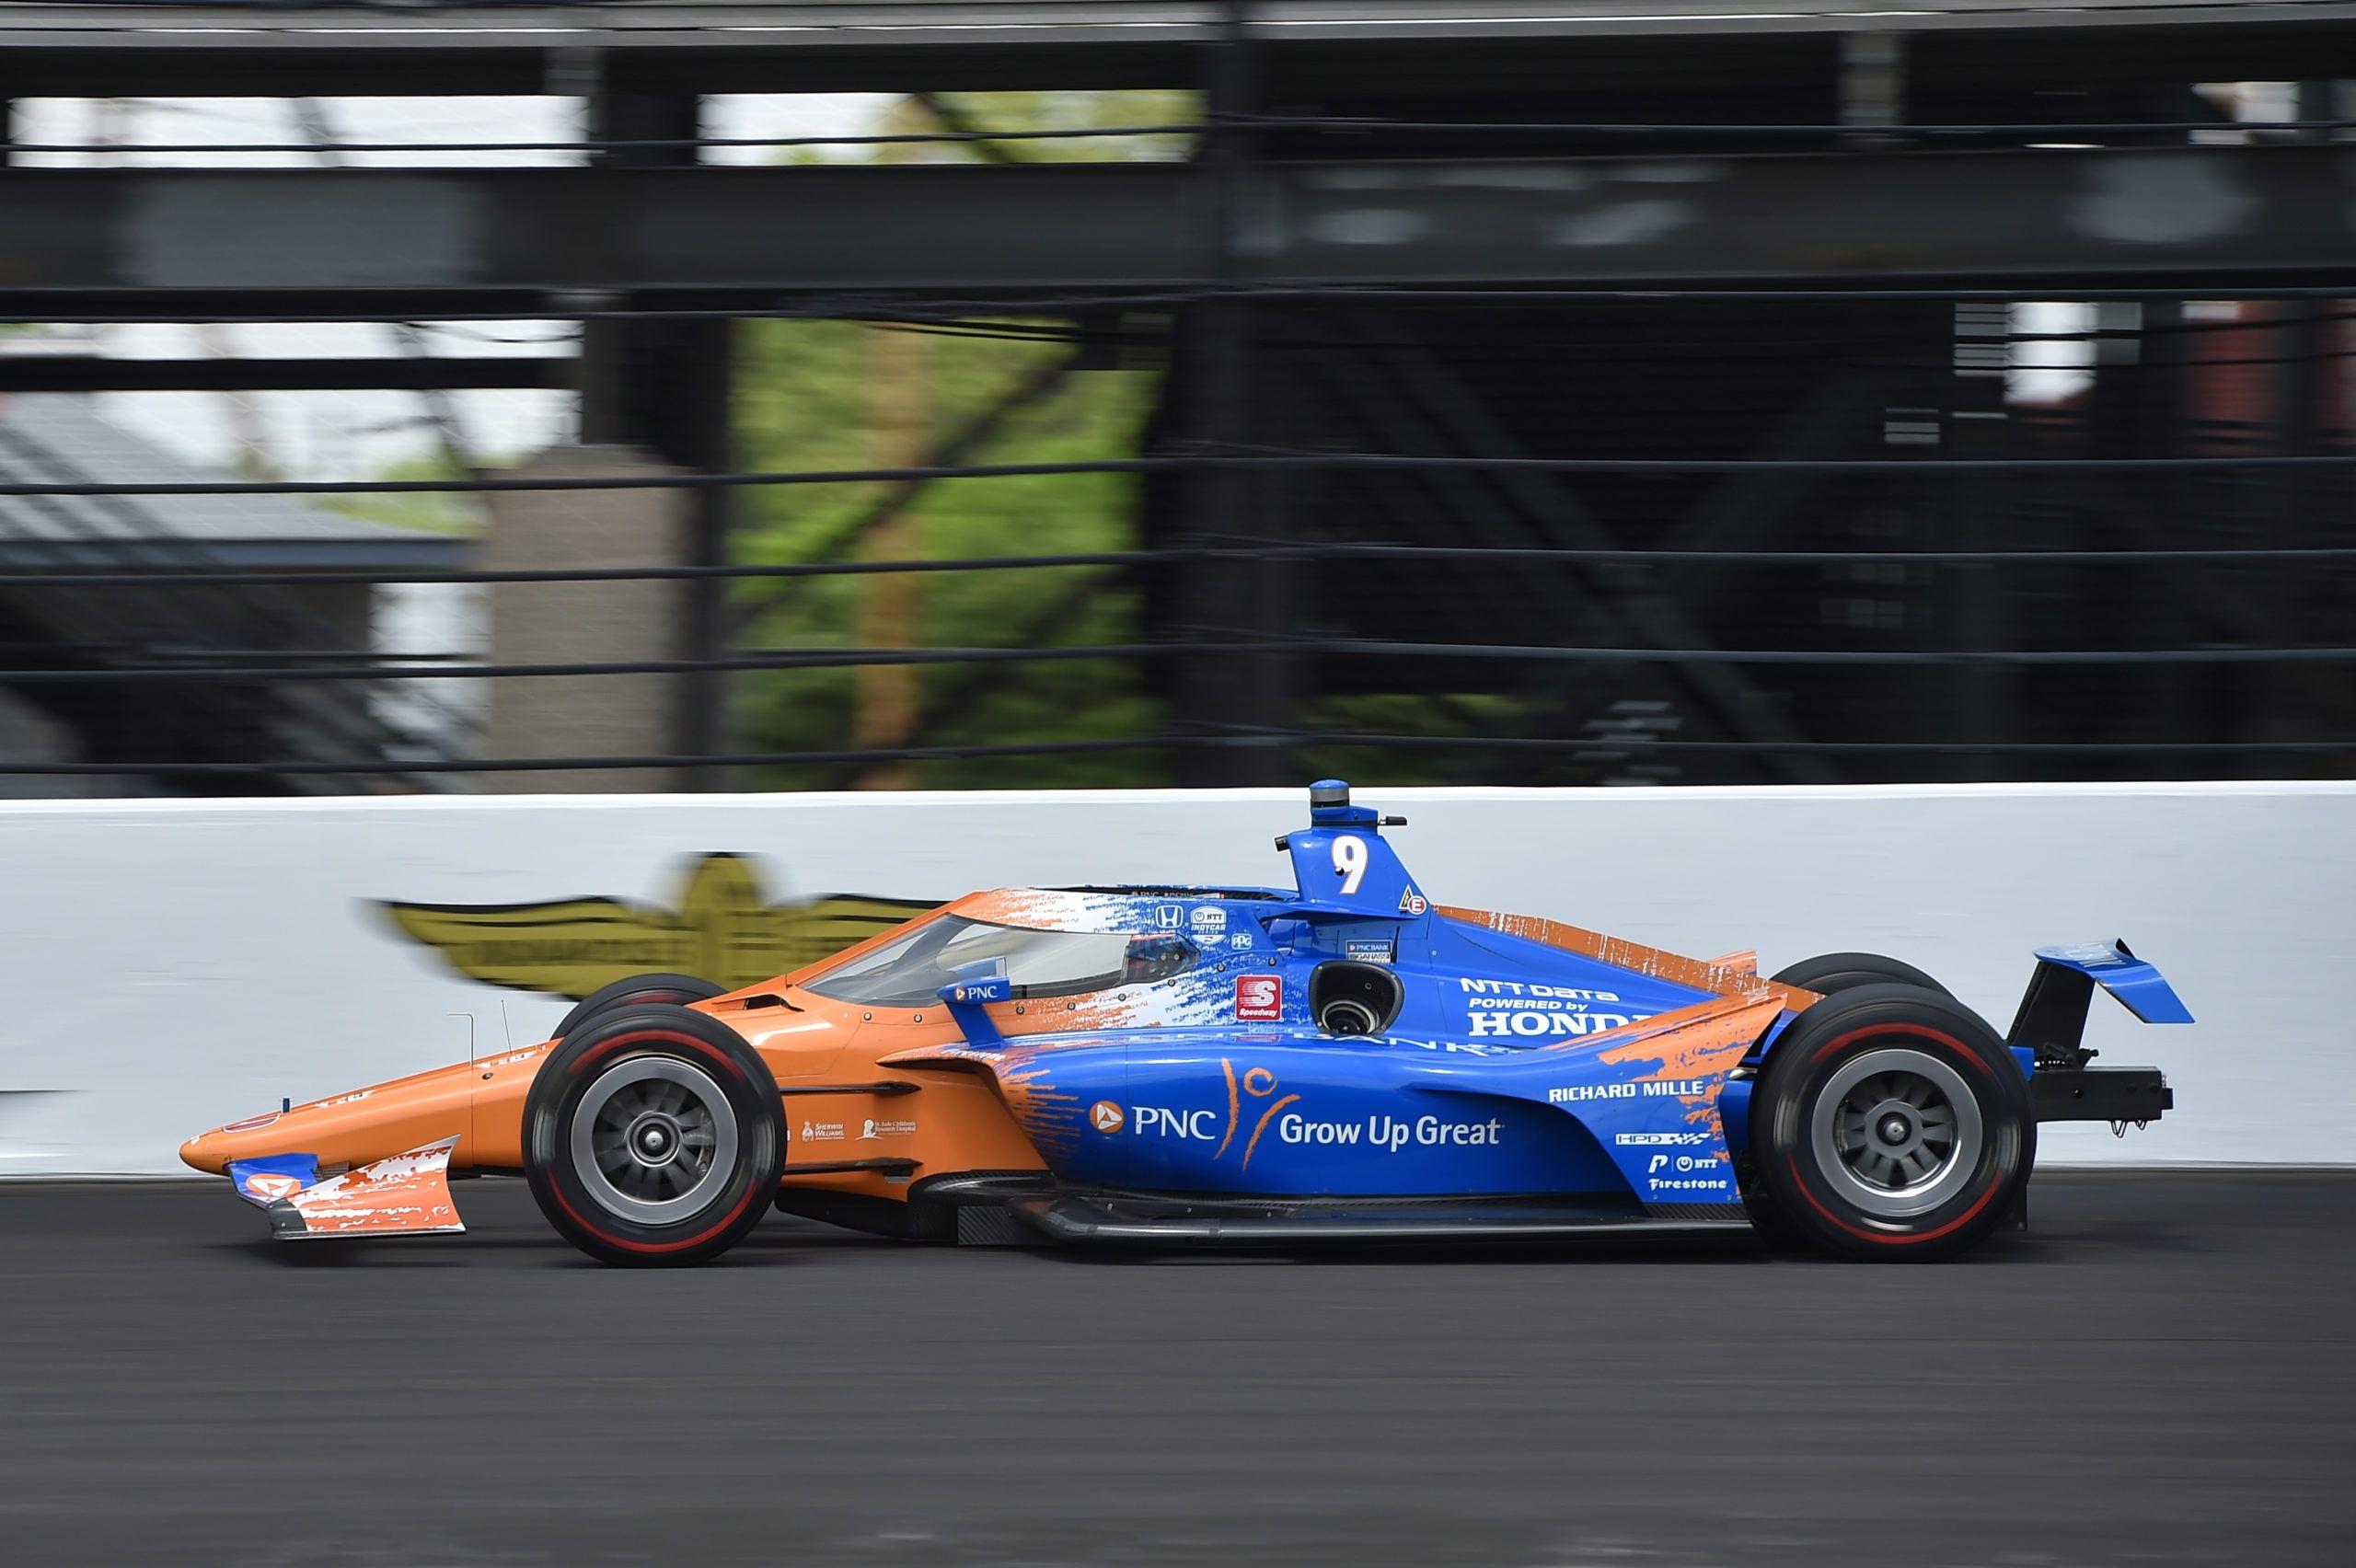 Scott Dixon, CGR IndyCar, 2021 Indy500, Indy500, IndyCar 2021, IndyCar